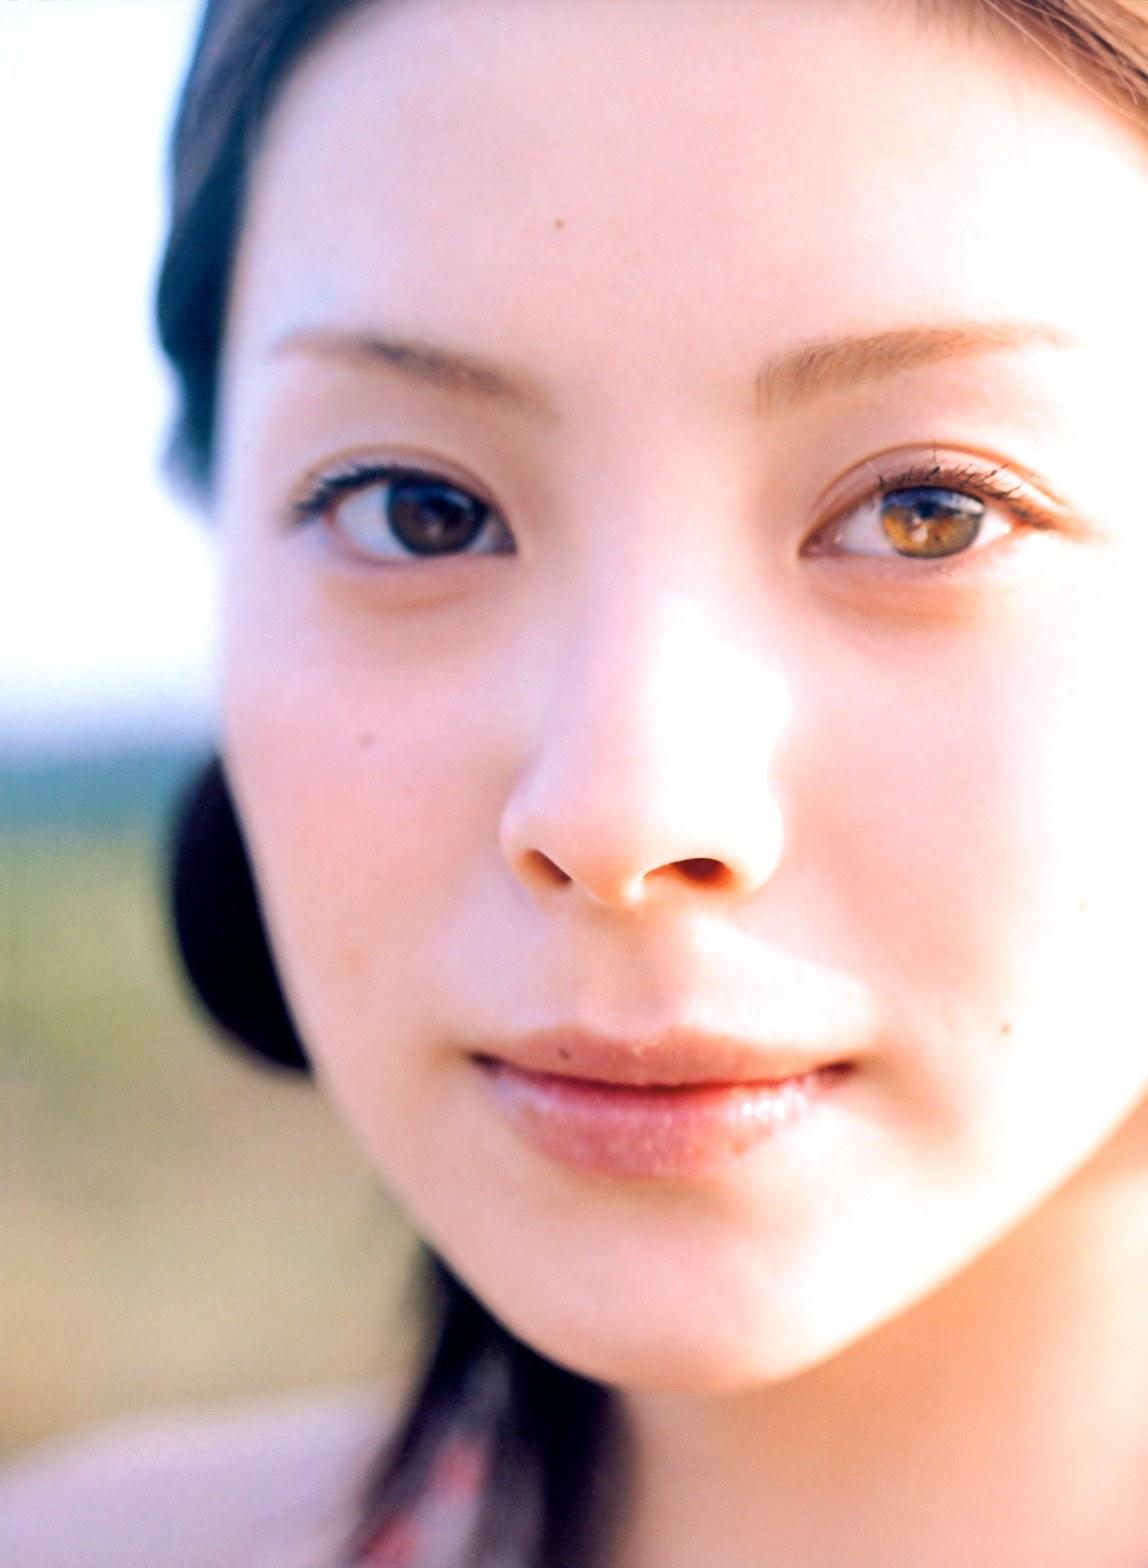 AyaMatsuura-A_PH5-69.jpg